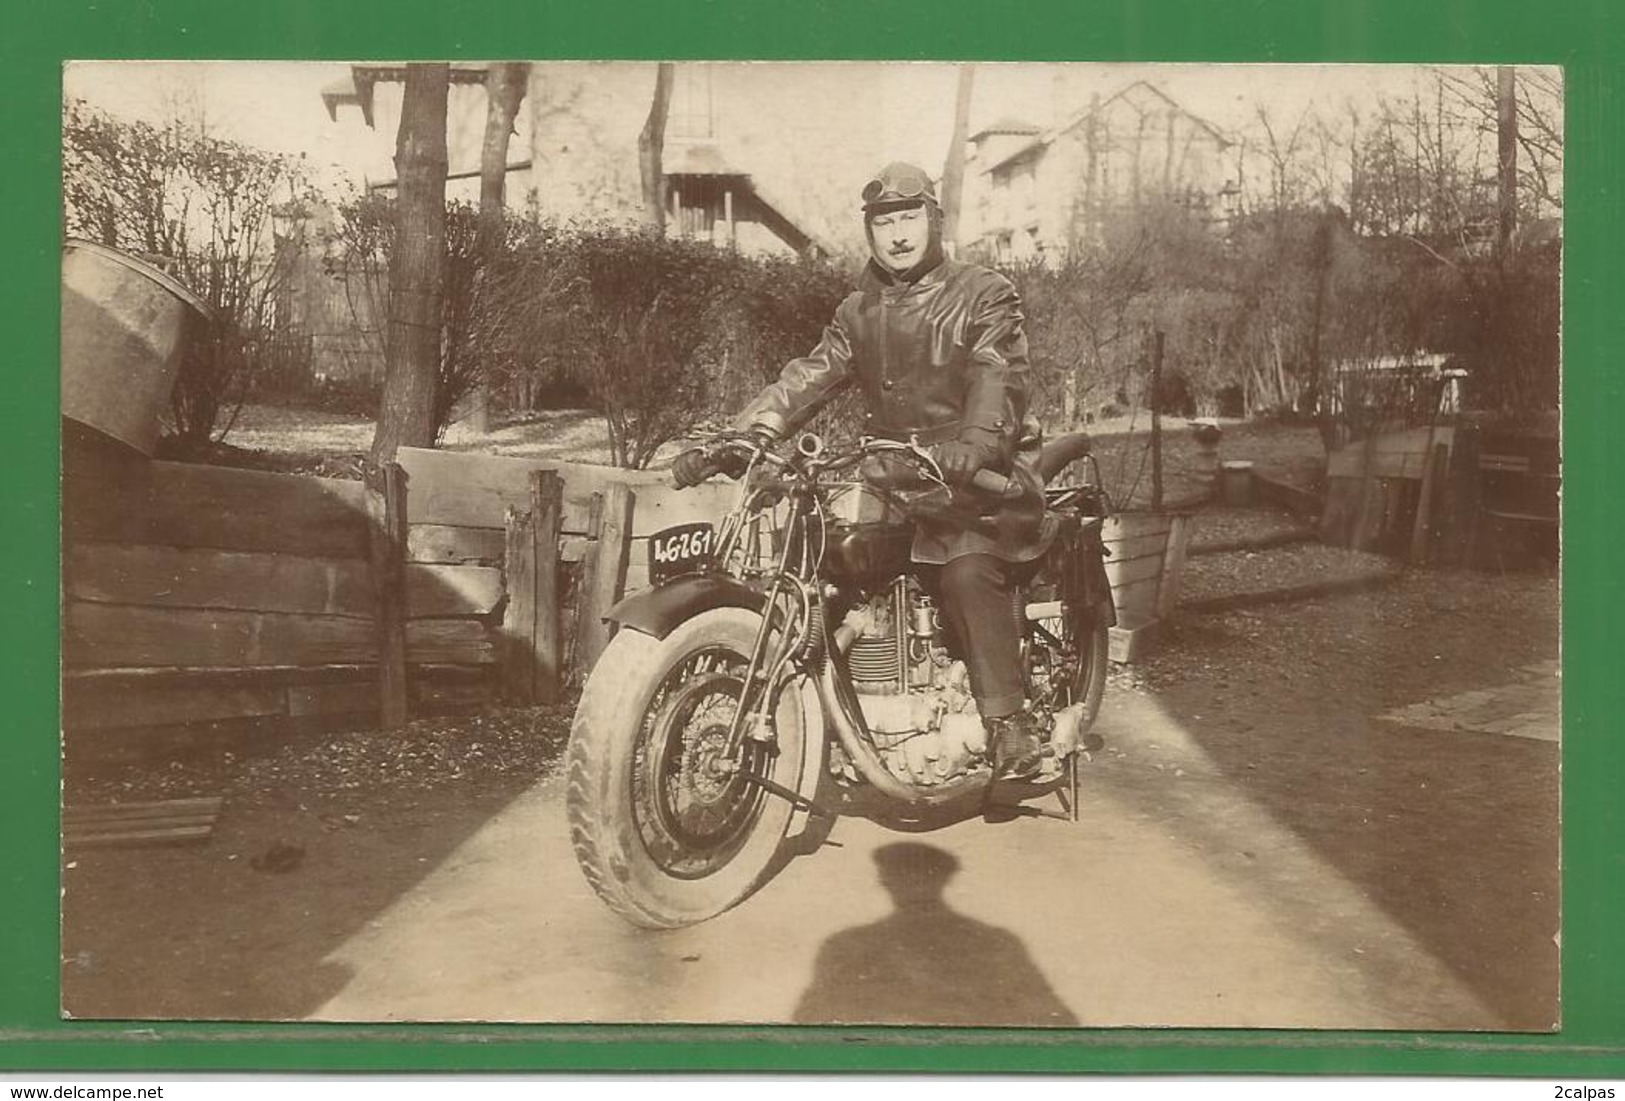 MORCEAU DE CARTE PHOTO ( 12,5 / 8 Cm )  :  MOTO  A IDENTIFIER - Motos